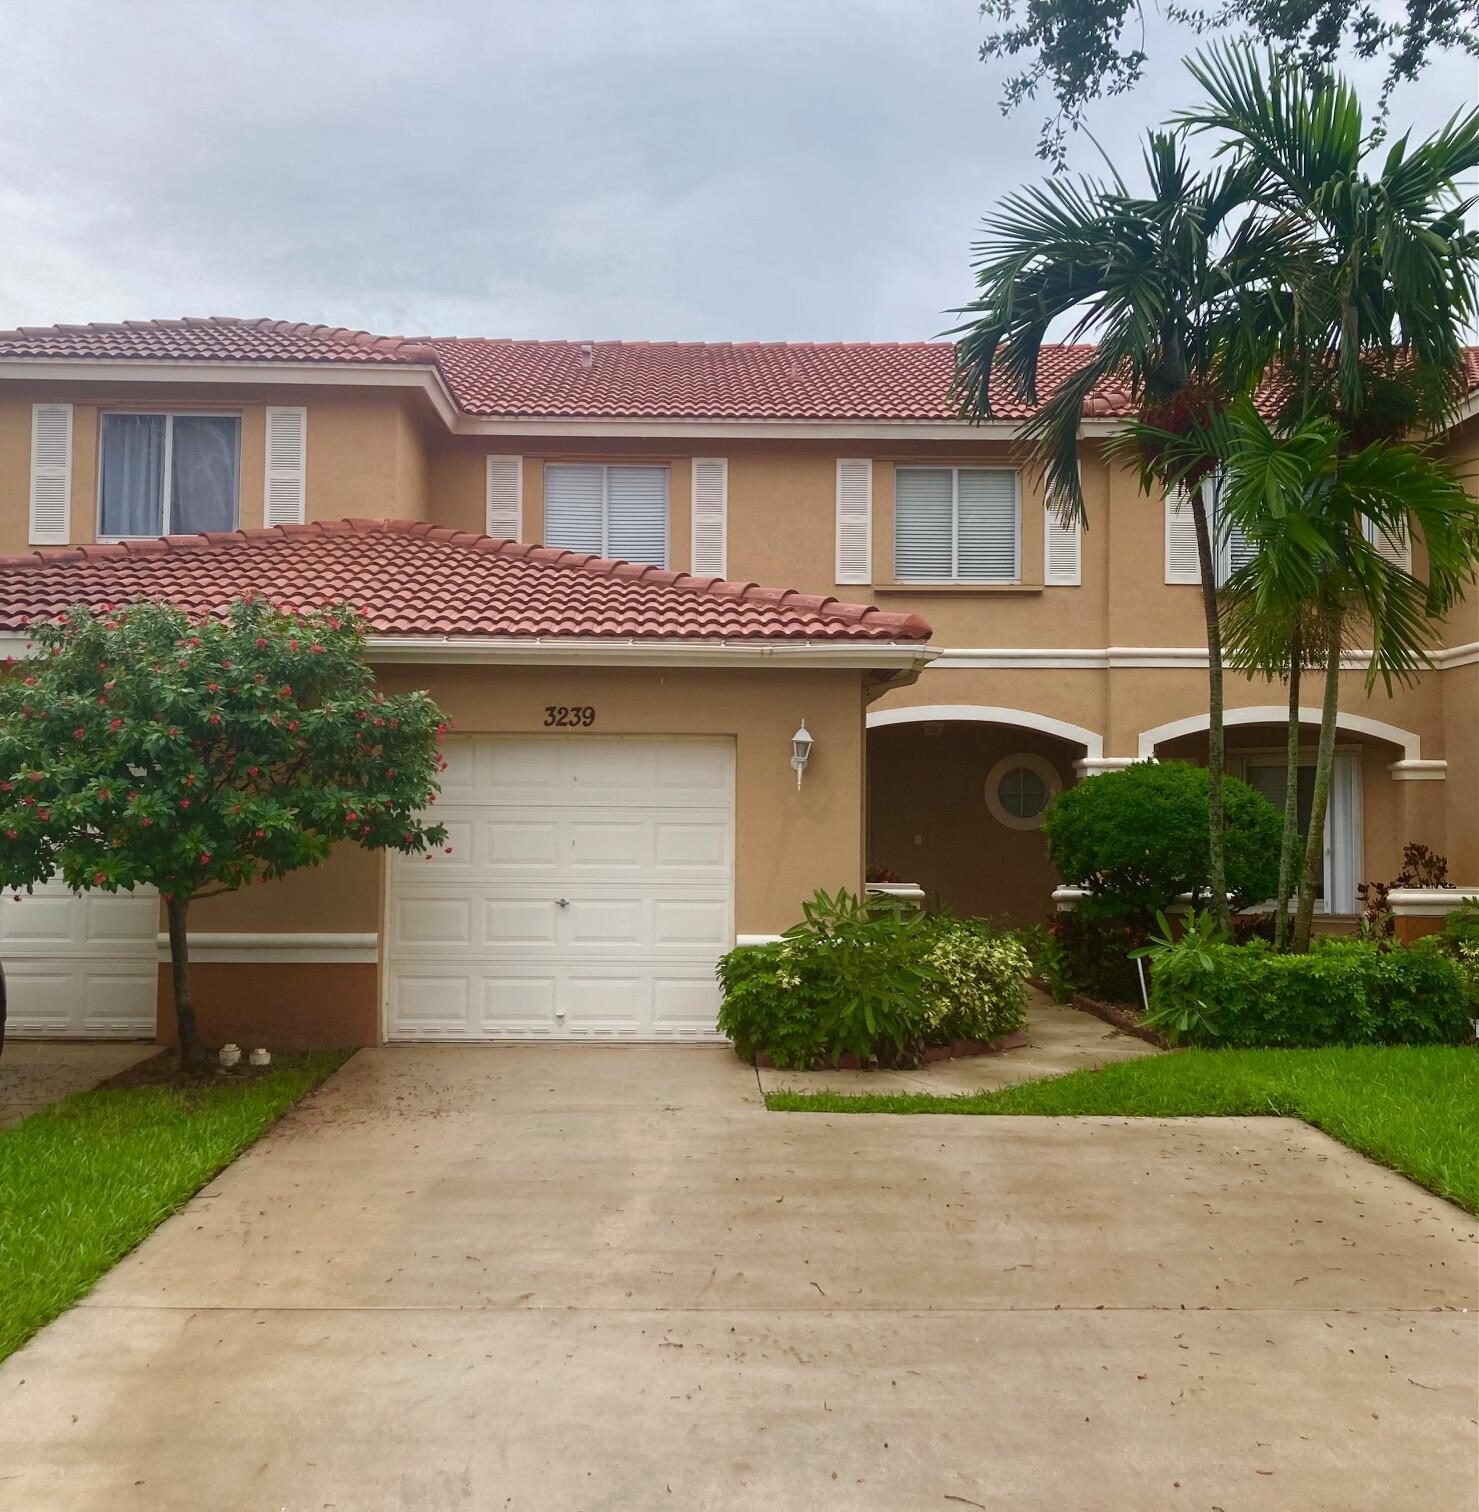 3239 Osprey Lane - 33411 - FL - West Palm Beach